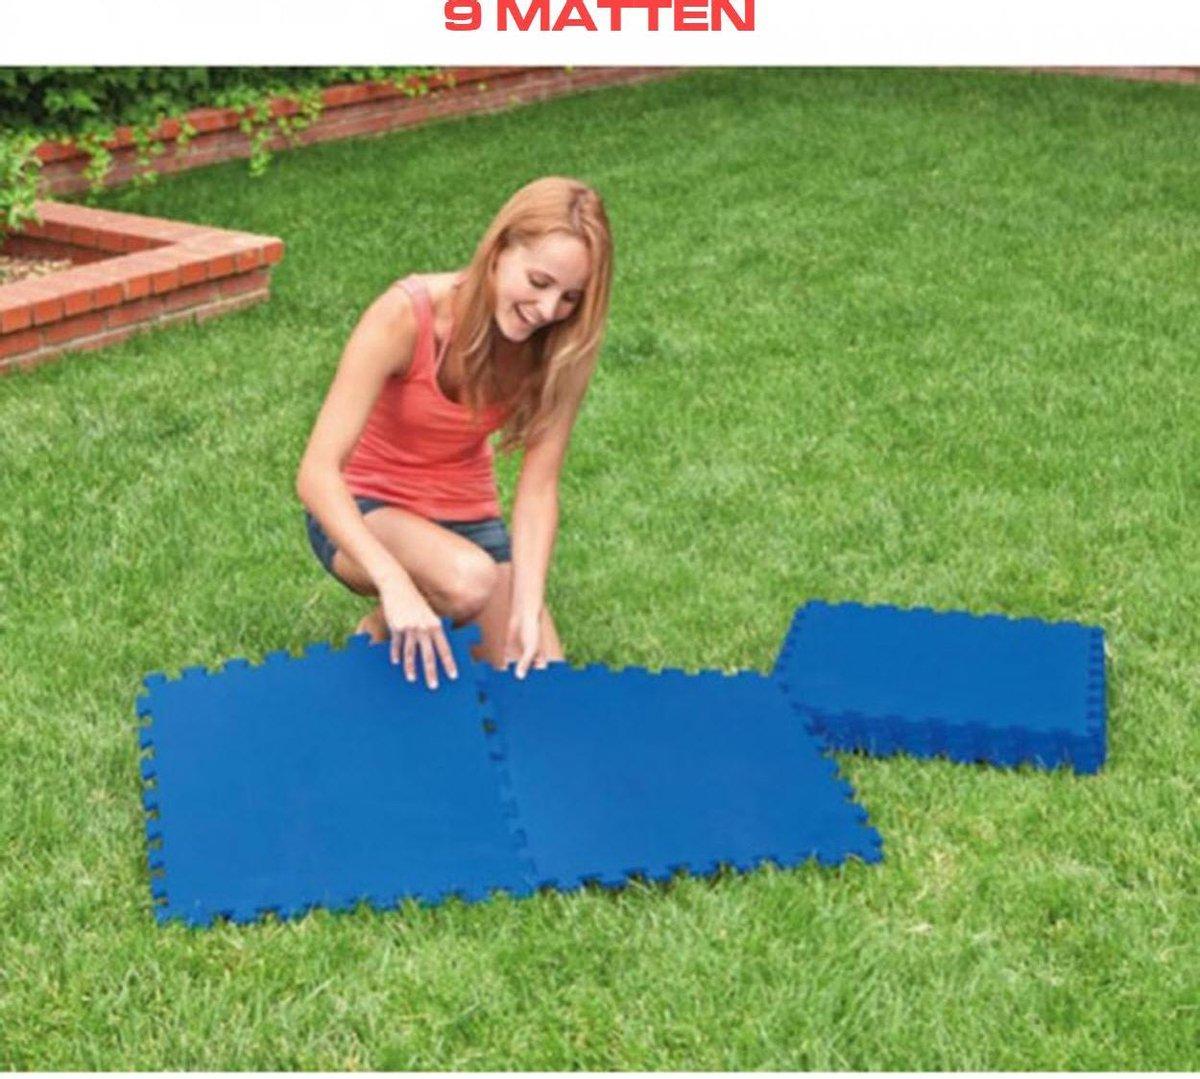 Zwembad |Yogamat 9 st. | Puzzelmat | Fitness tegels | fit sport